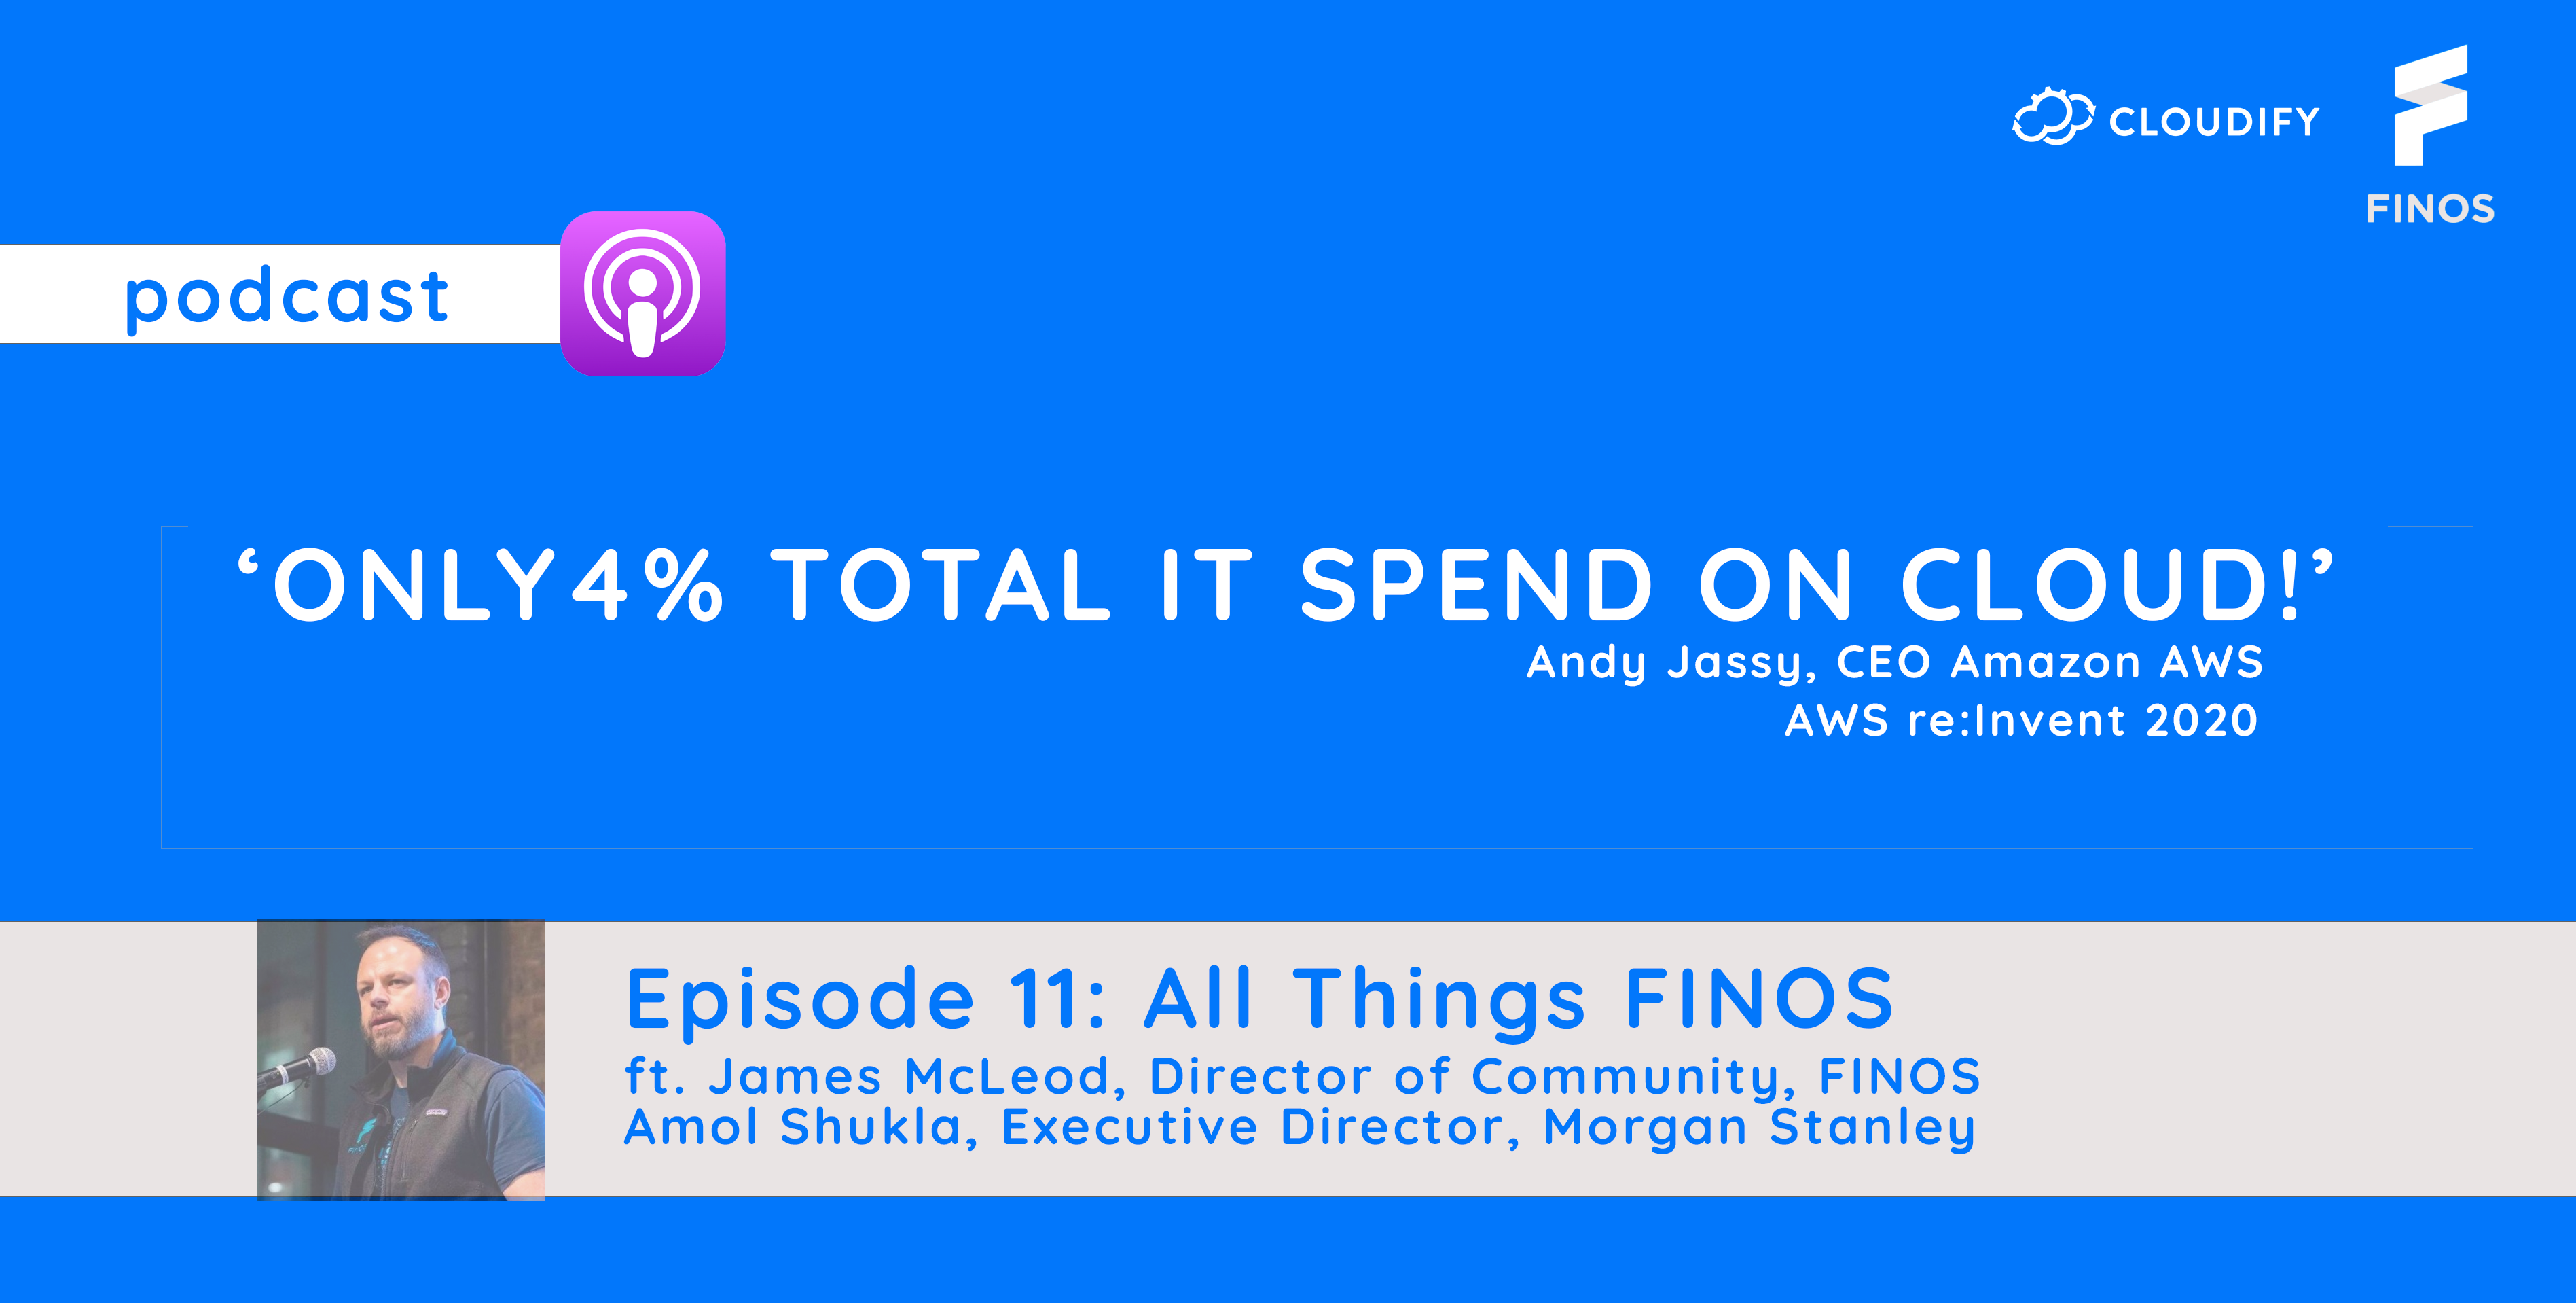 Cloudify podcast 11 FINOS